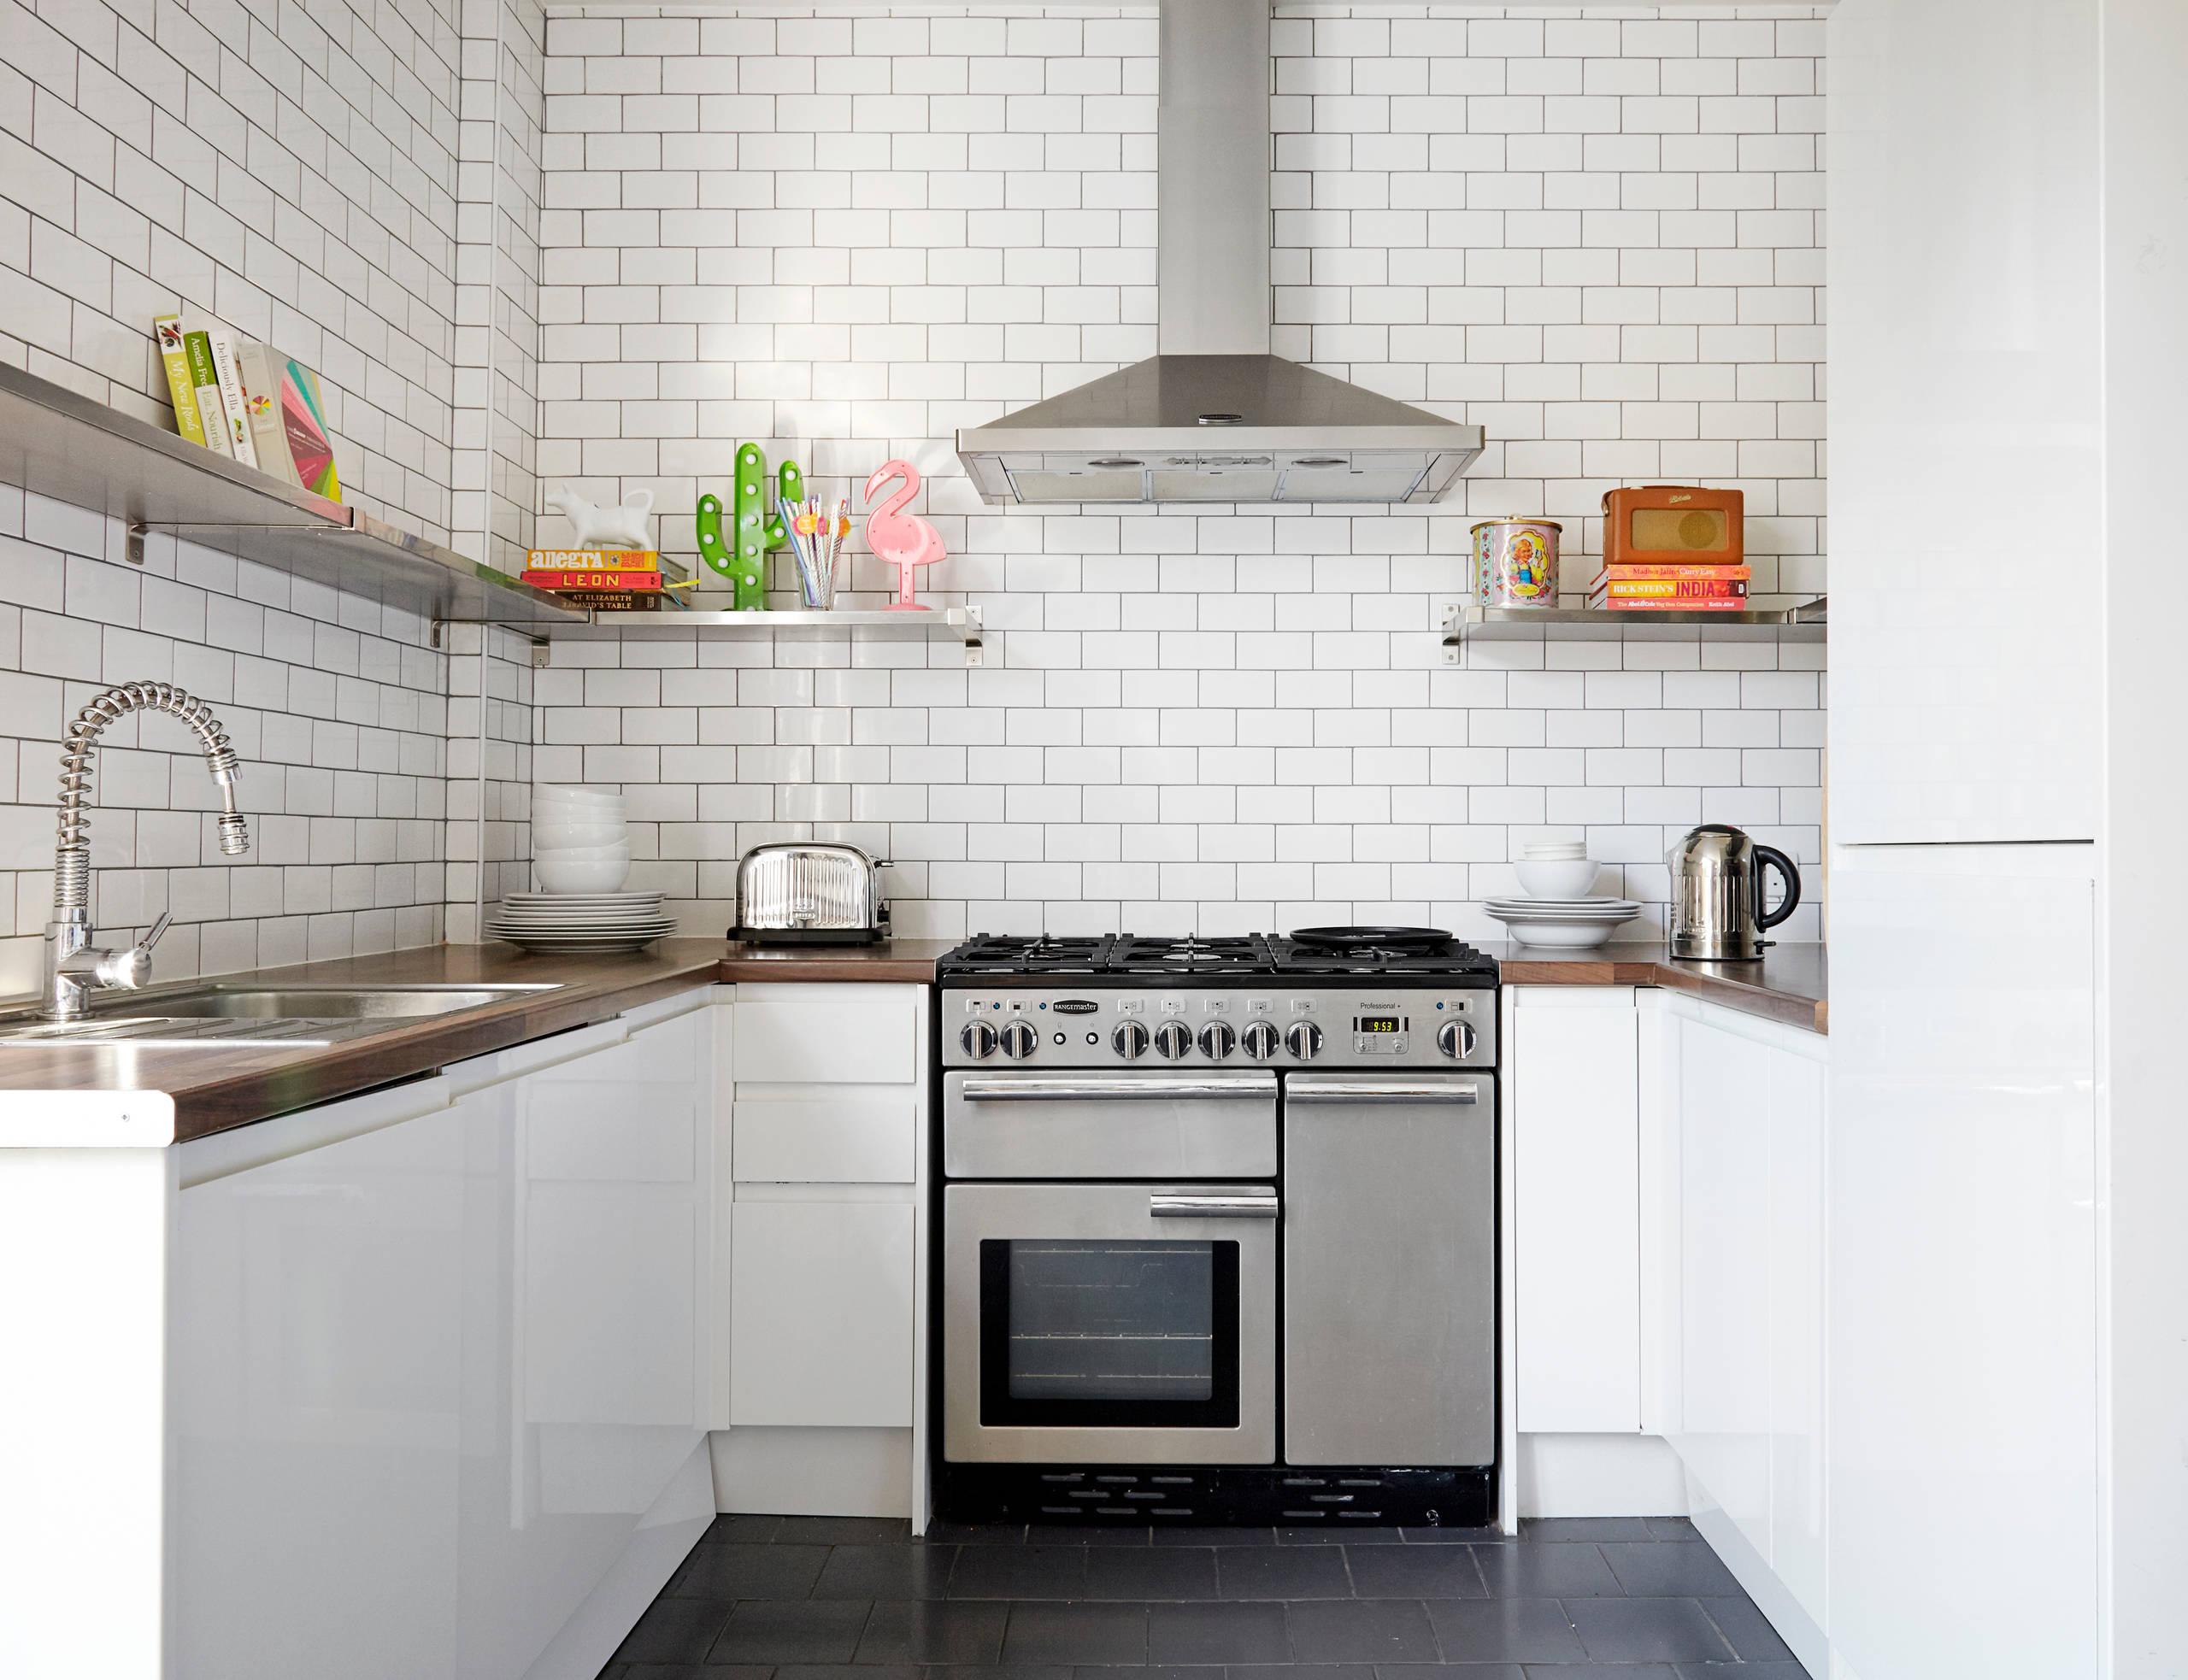 Kitchen Cabinet Alternatives Should I Remove My Kitchen Wall ...